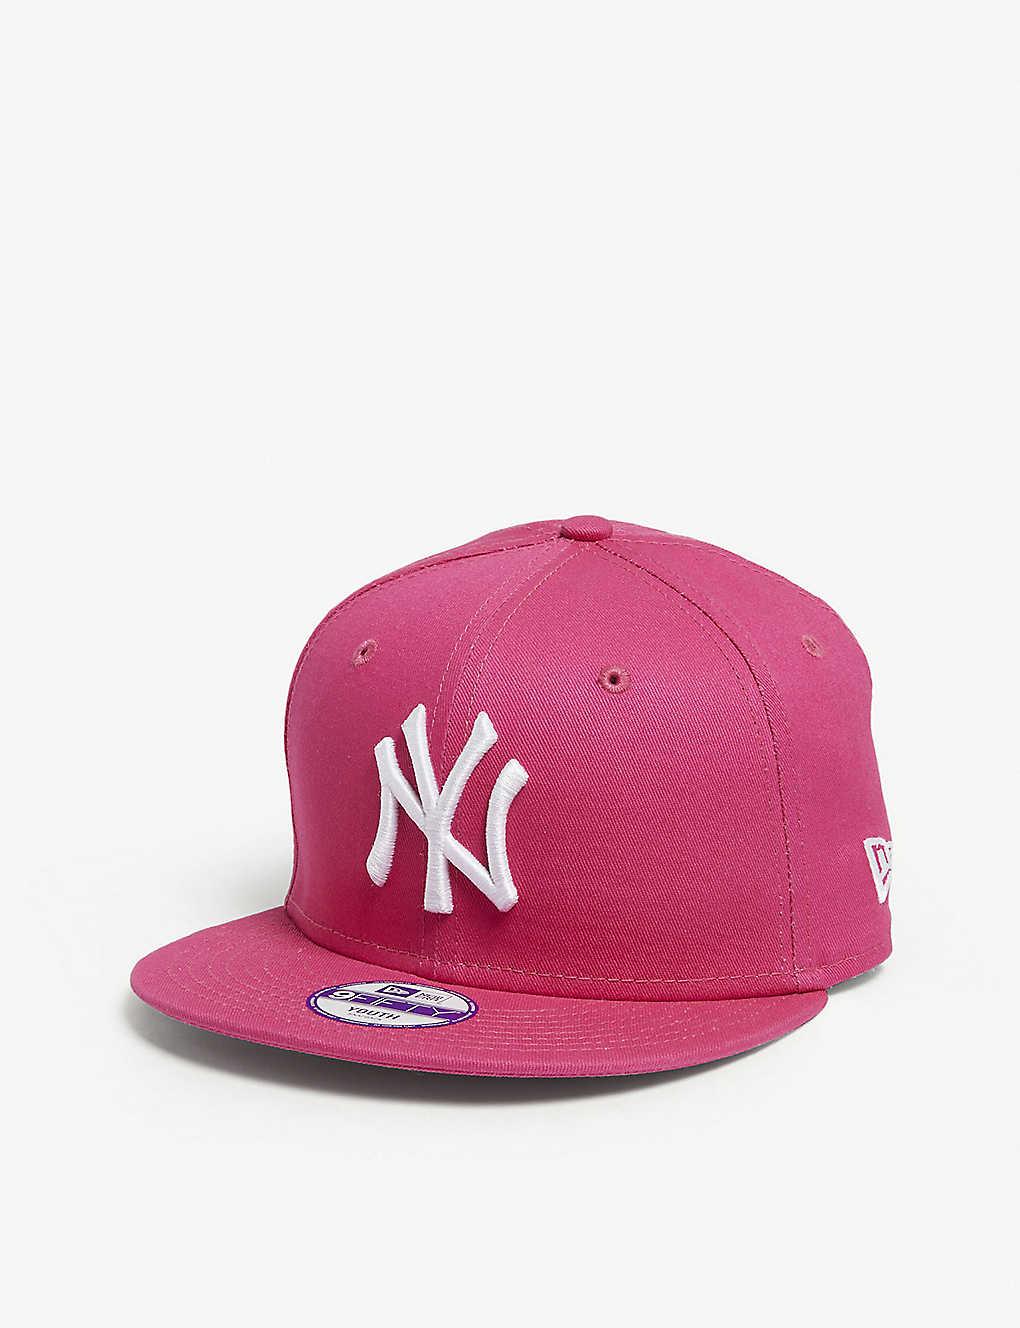 NEW ERA - 9FIFTY New York Yankees snapback cap  cfdbab3a57b